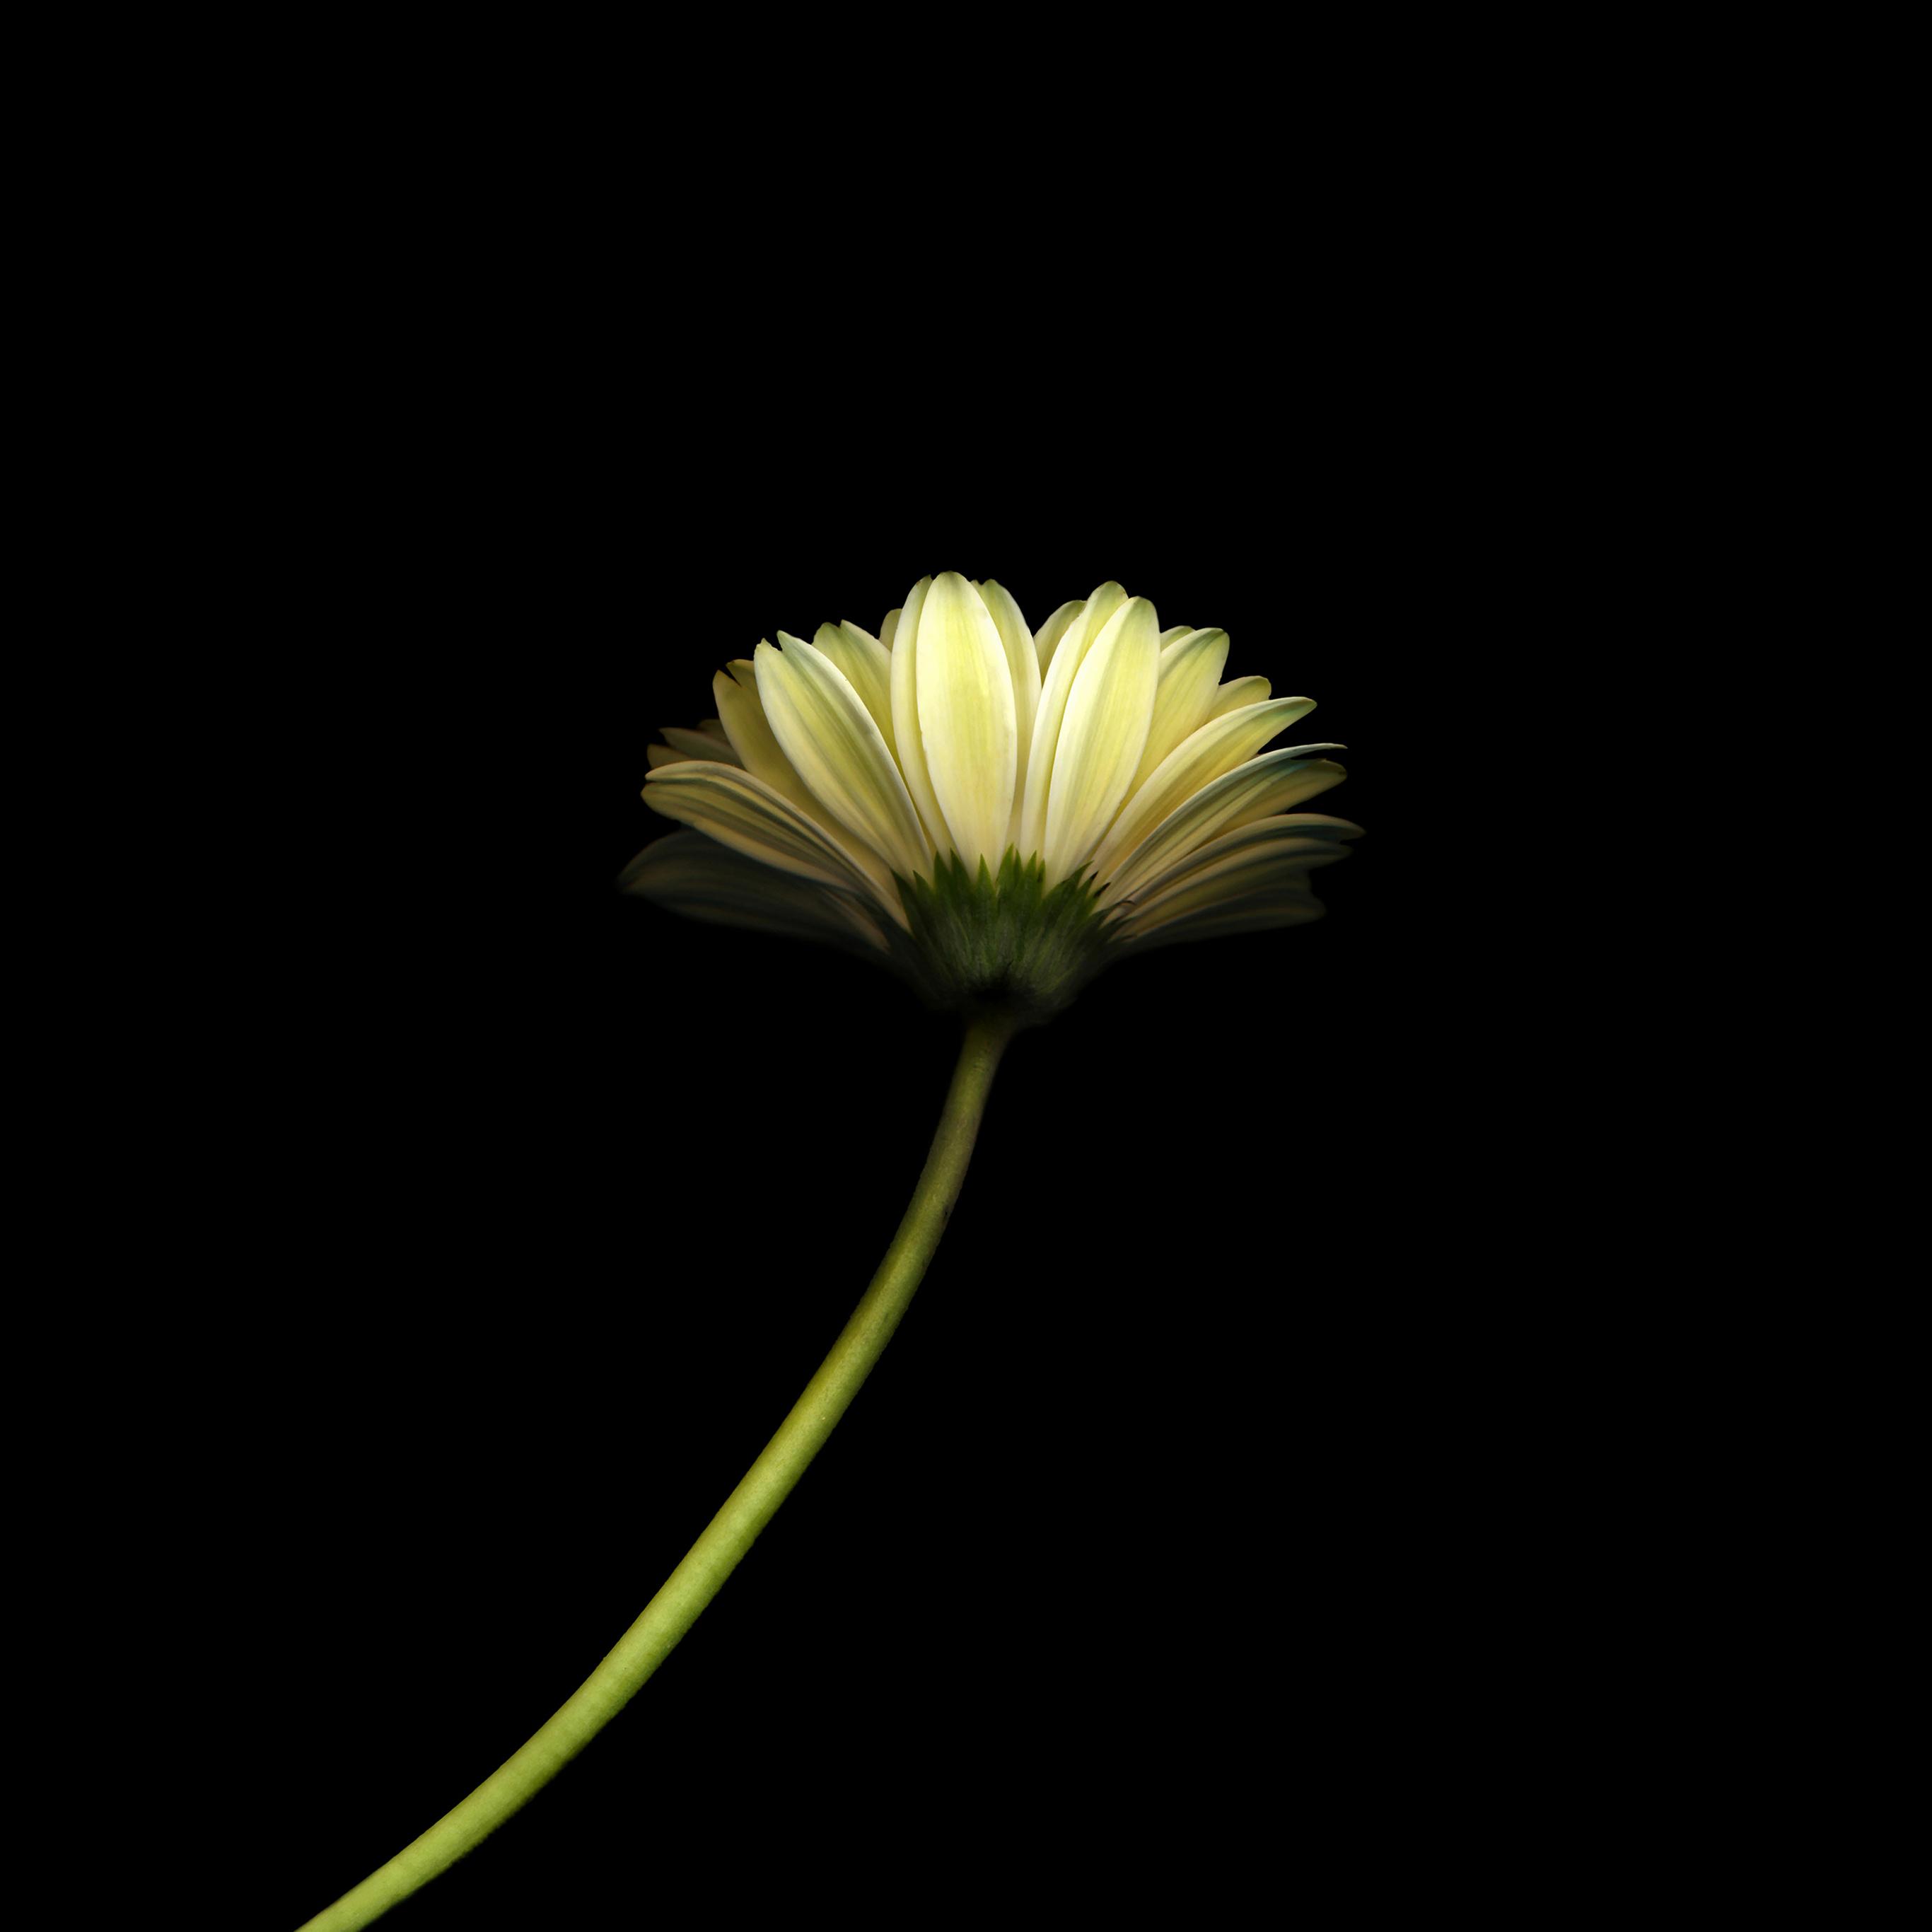 Mk67-lonely-flower-dark-simple-minimal-nature